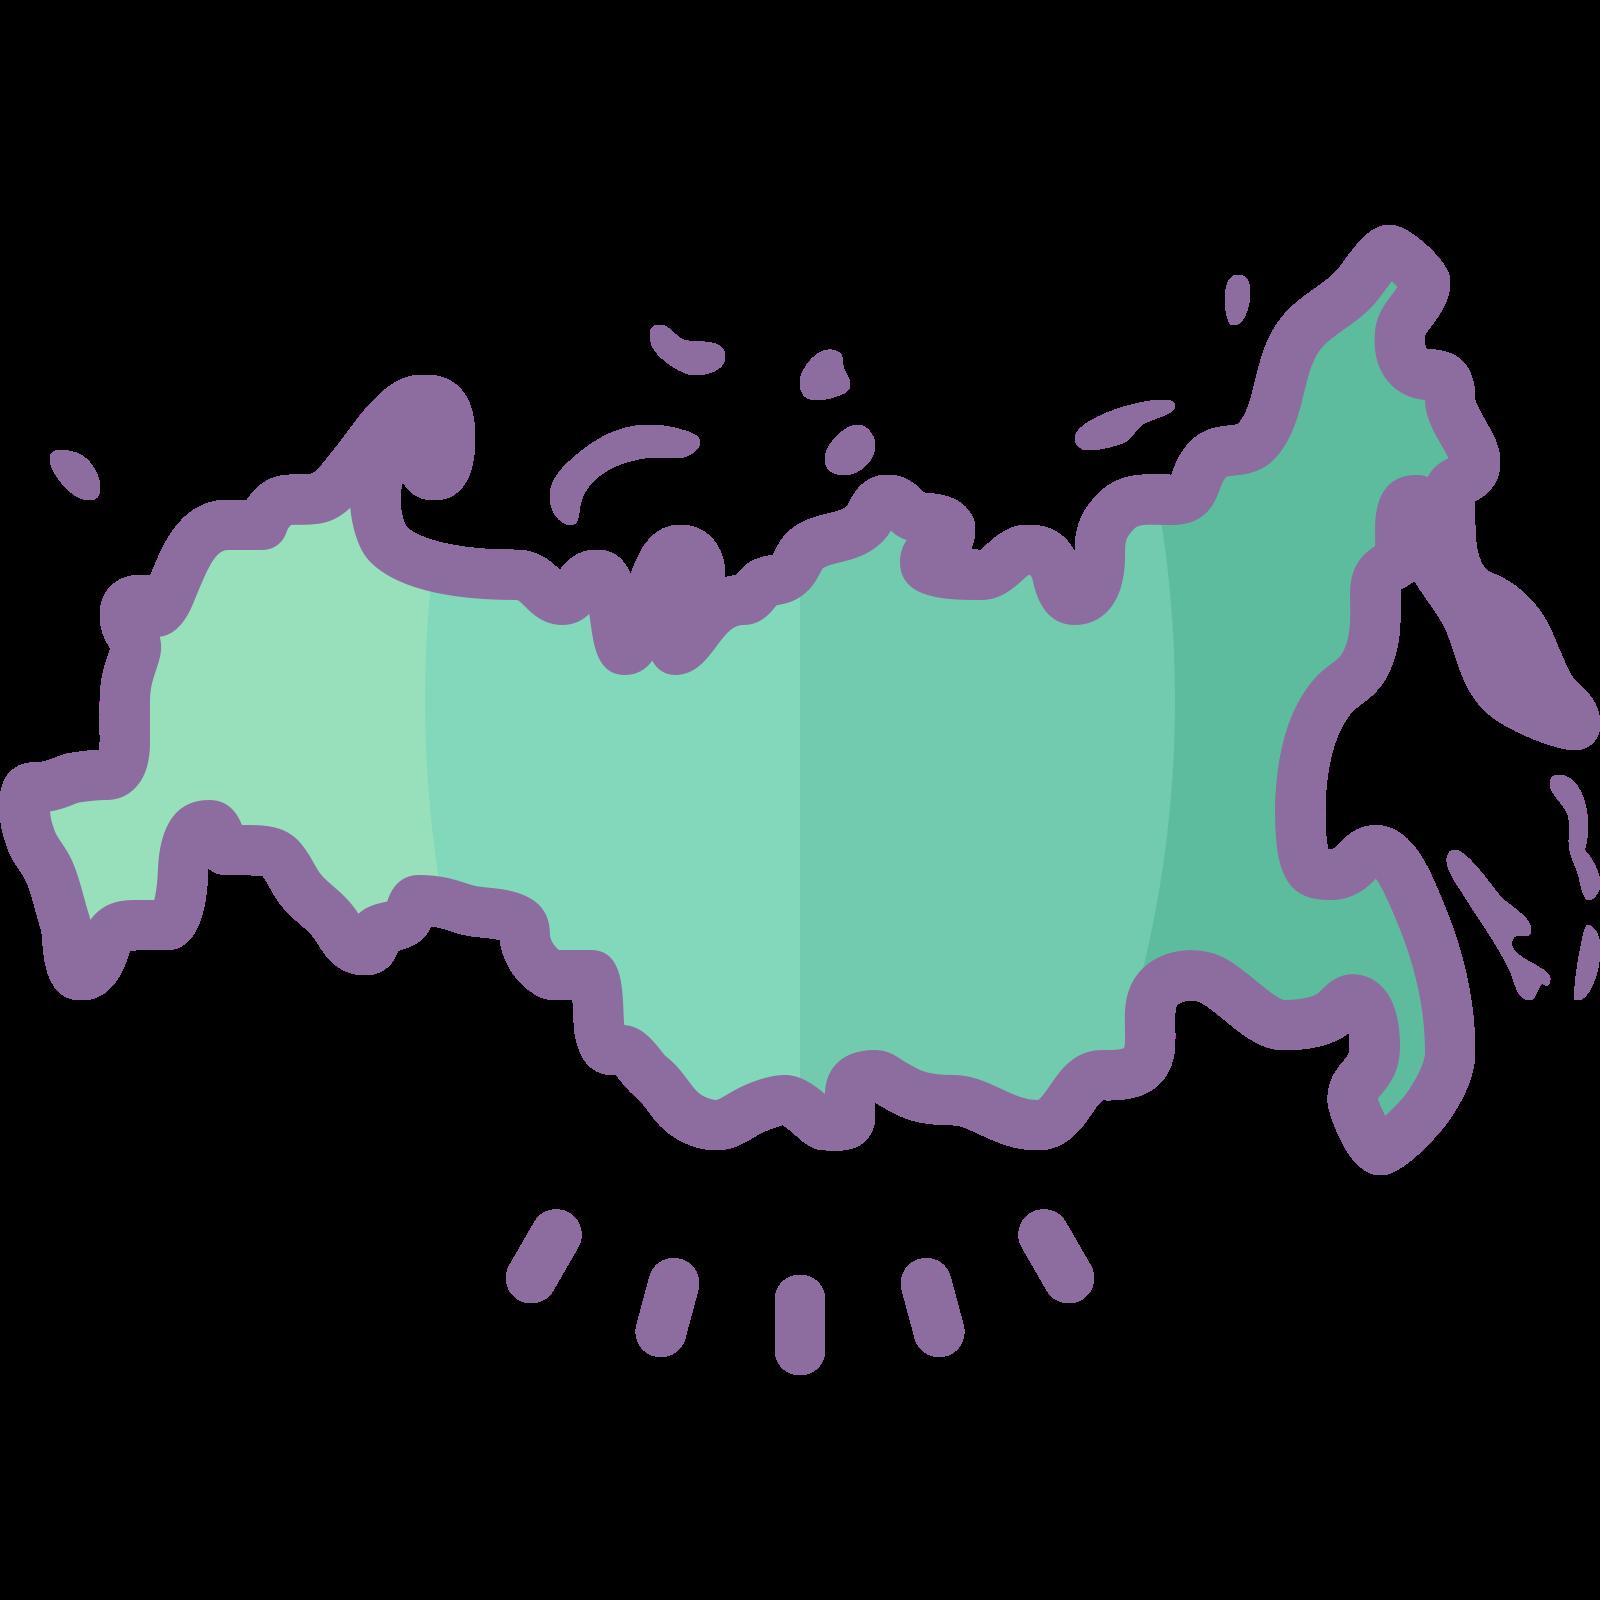 Russia Map icon